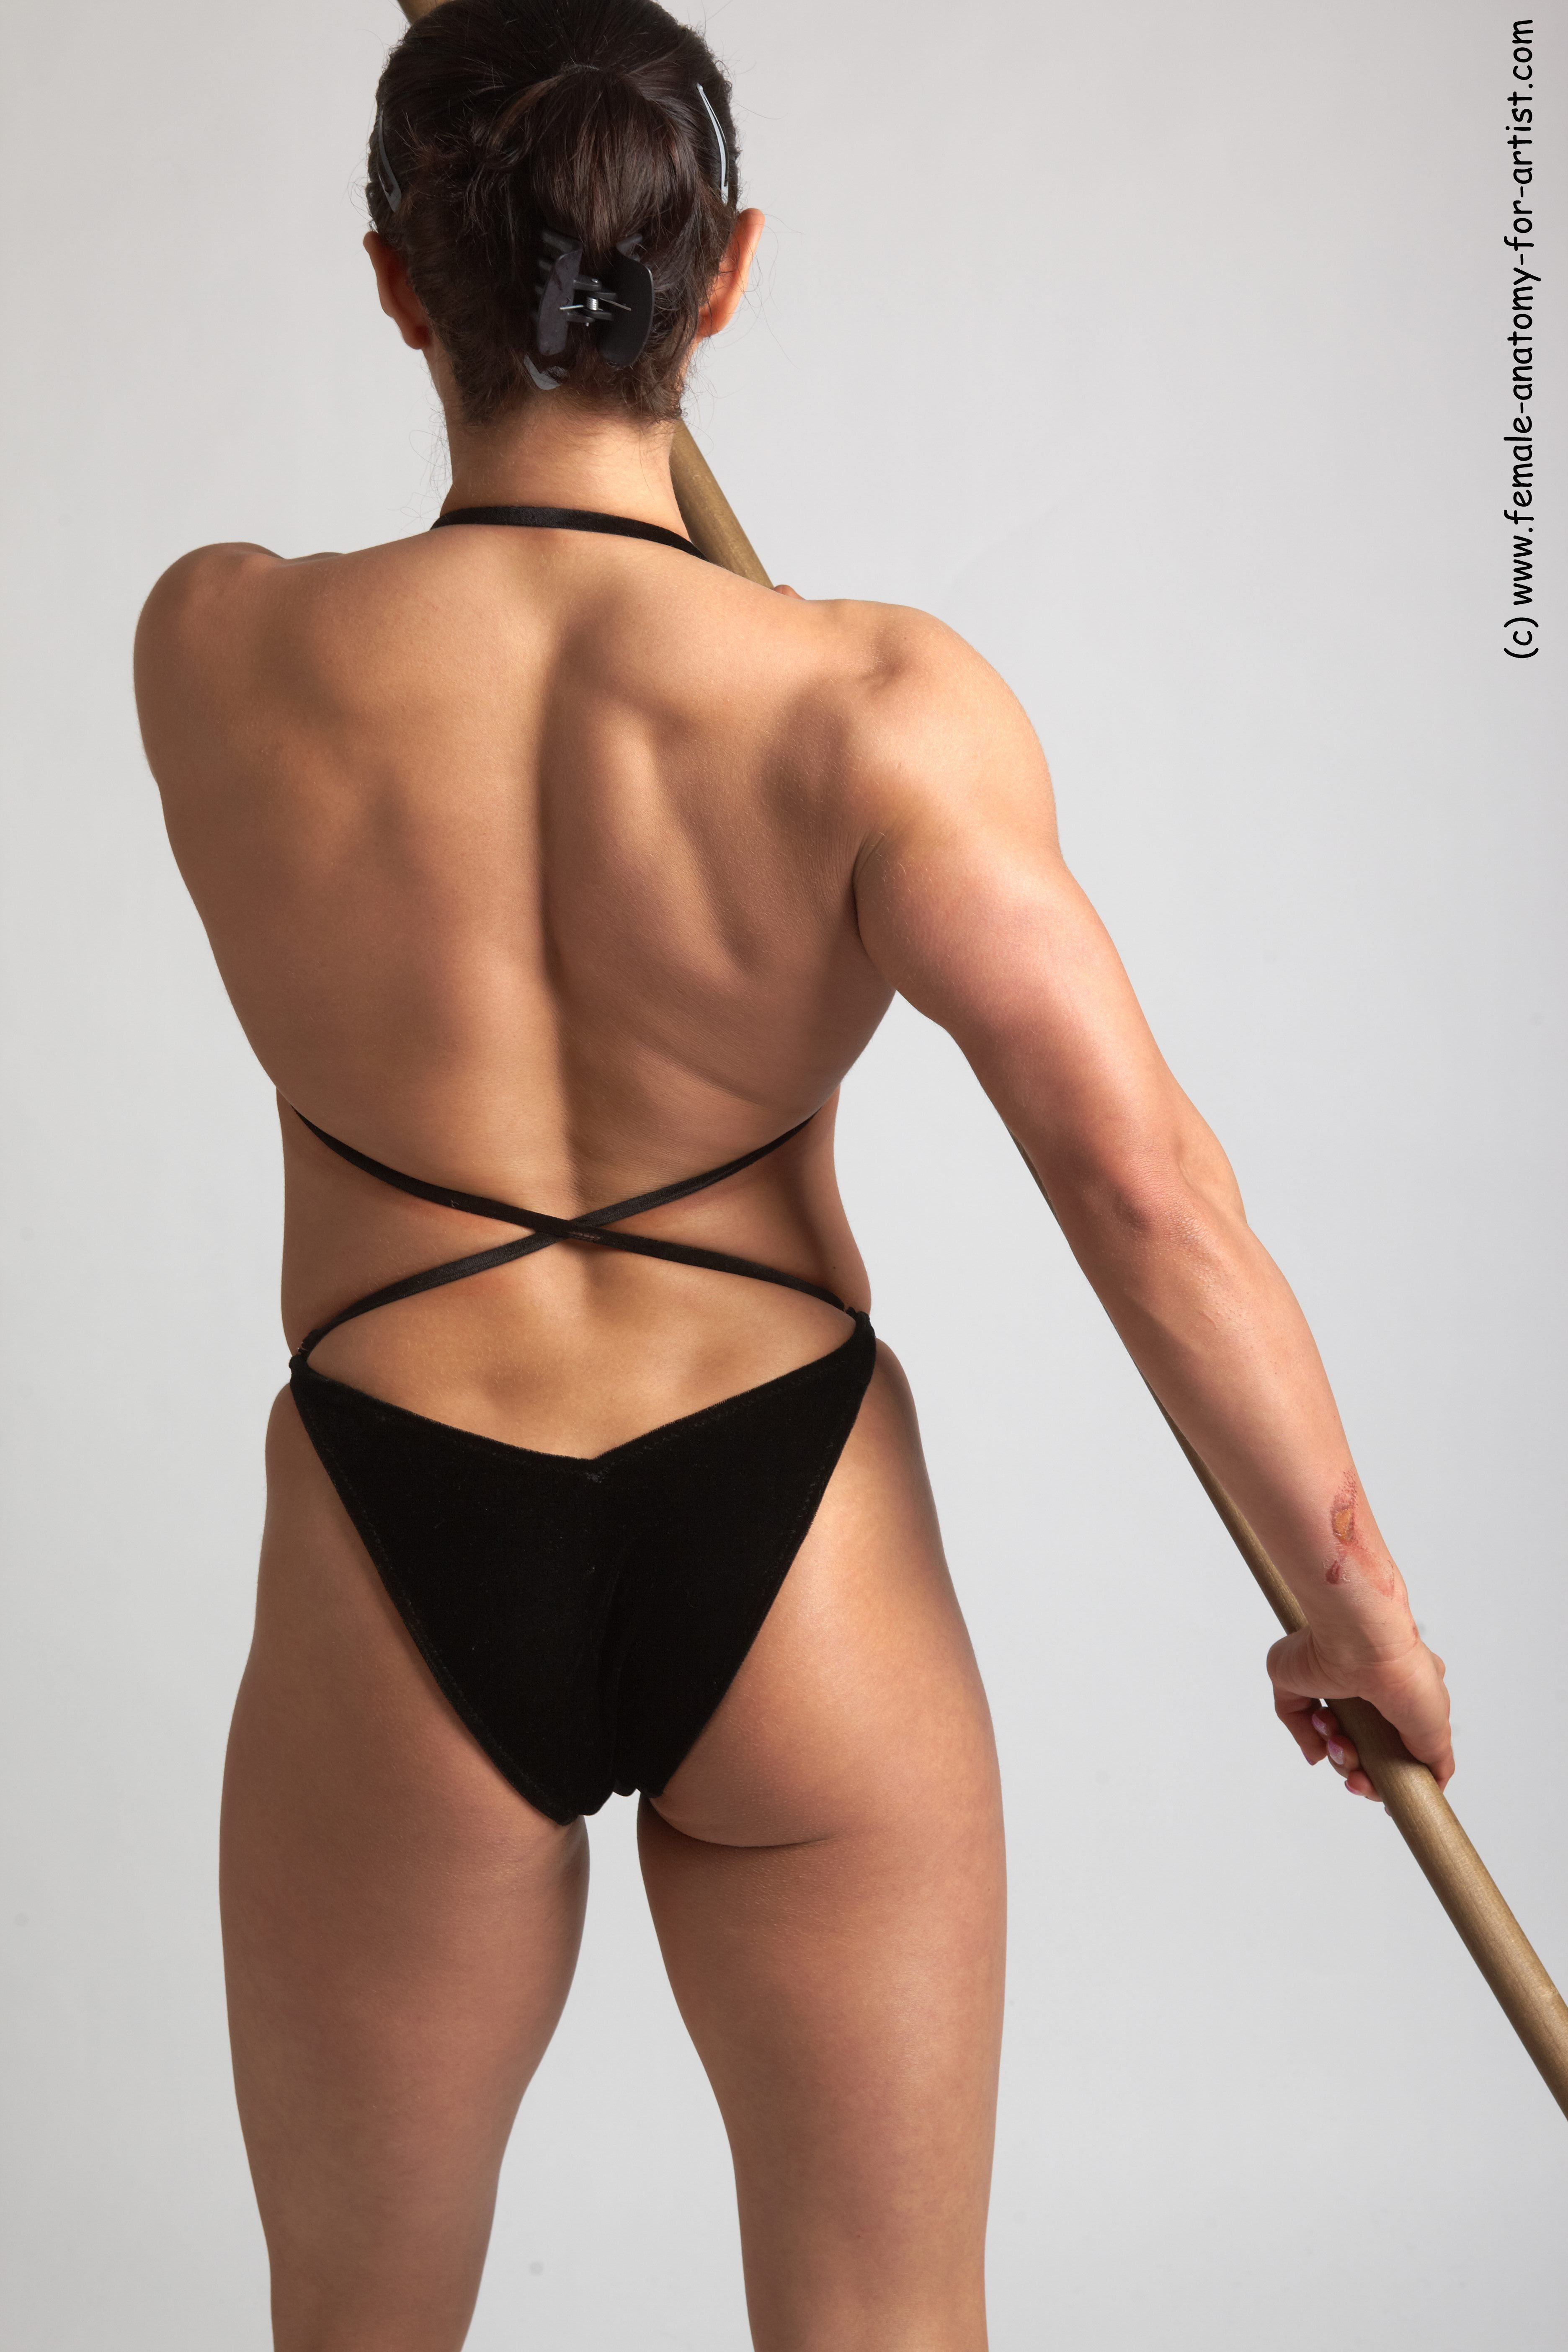 71323-oxana_requested_29.jpg (3744×5616) | Female Anatomy for Artist ...